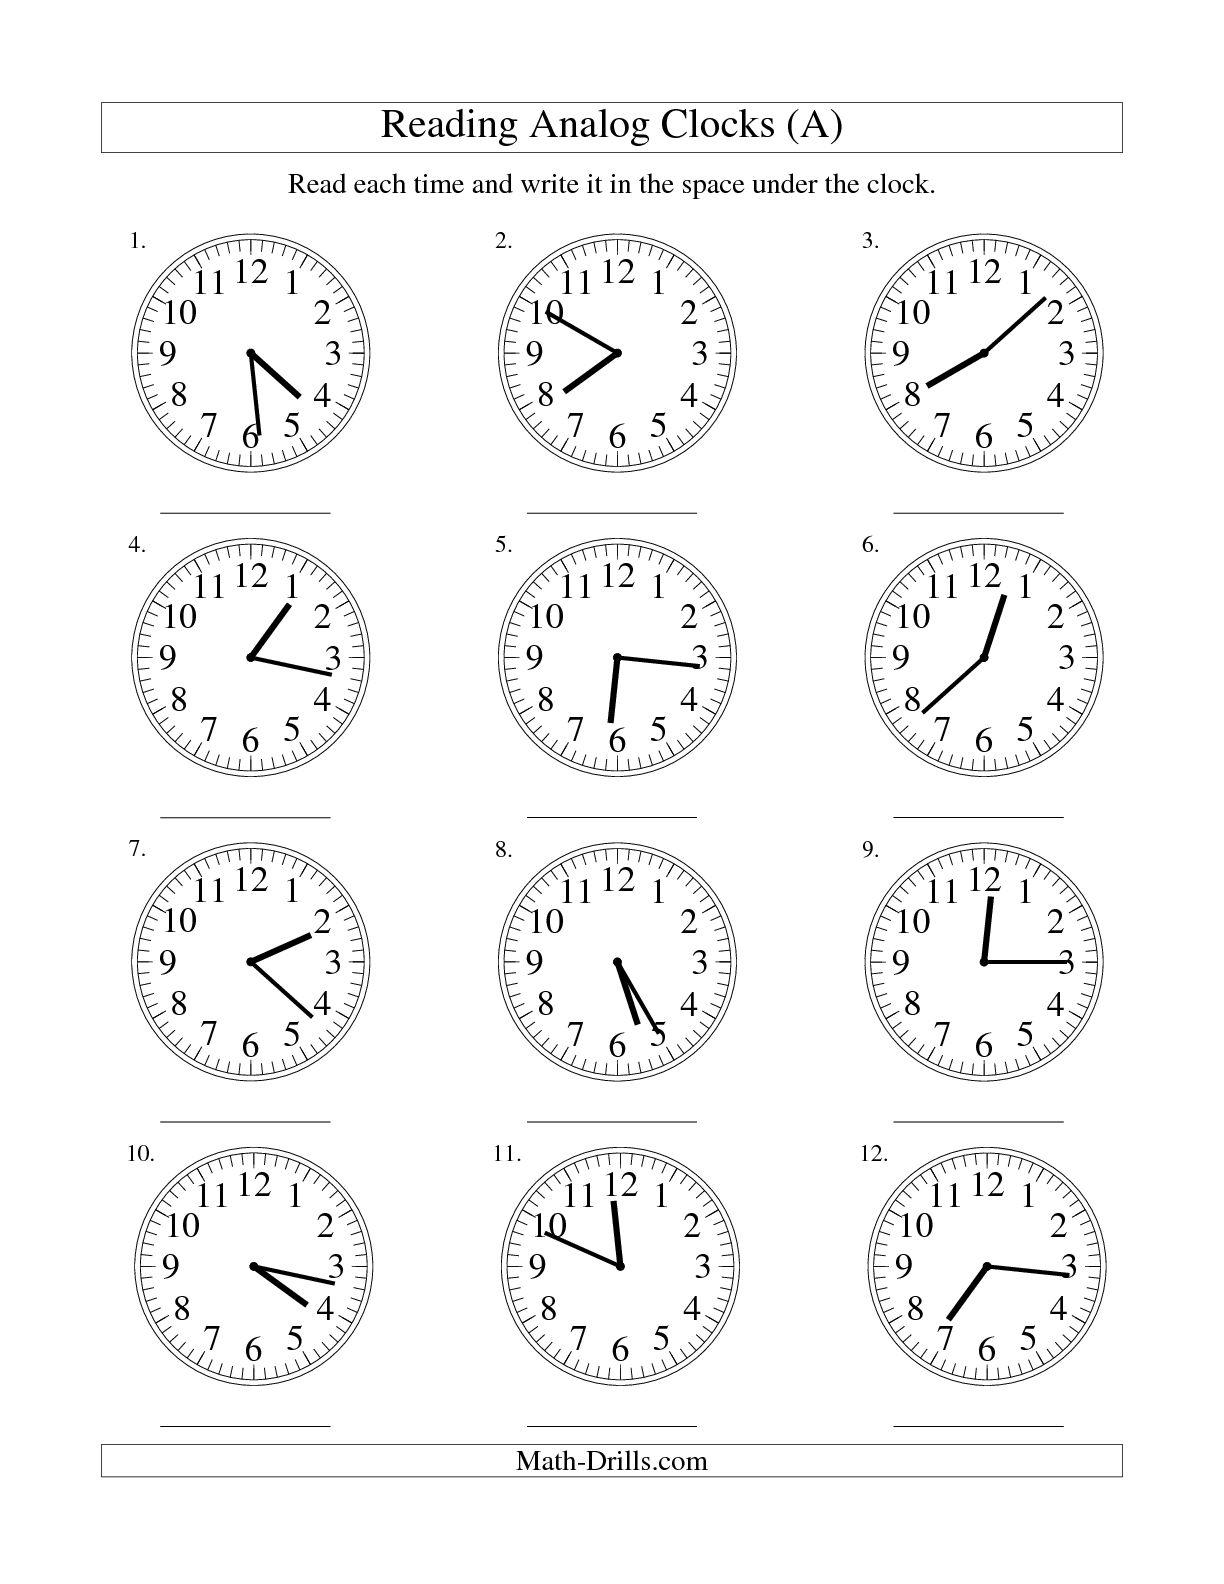 Digital Andog Clock Worksheets